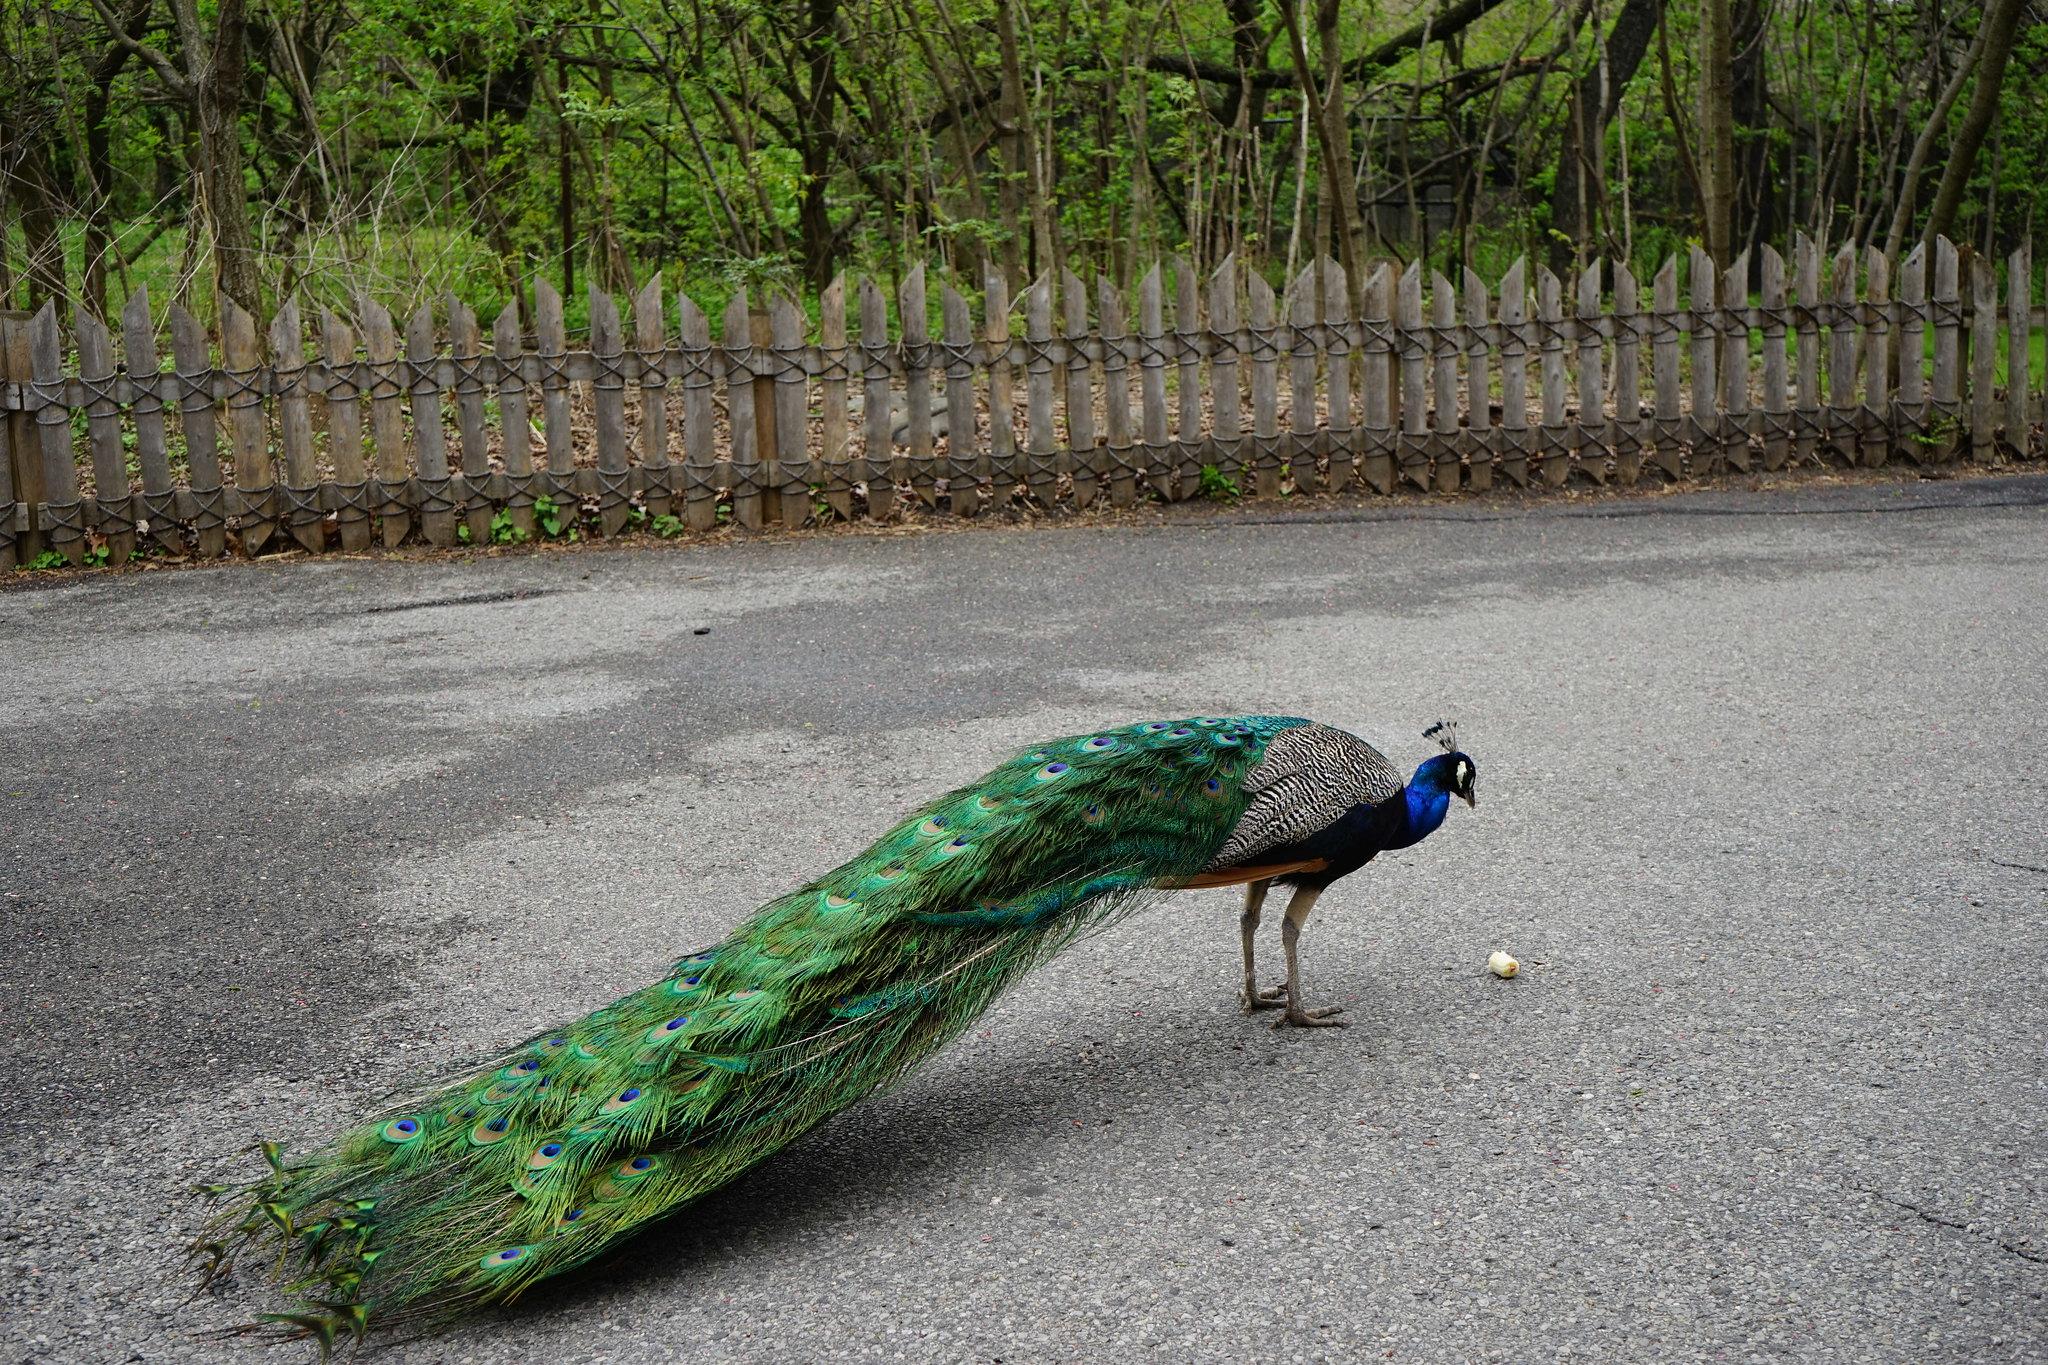 The Bronx Zoo Peacock